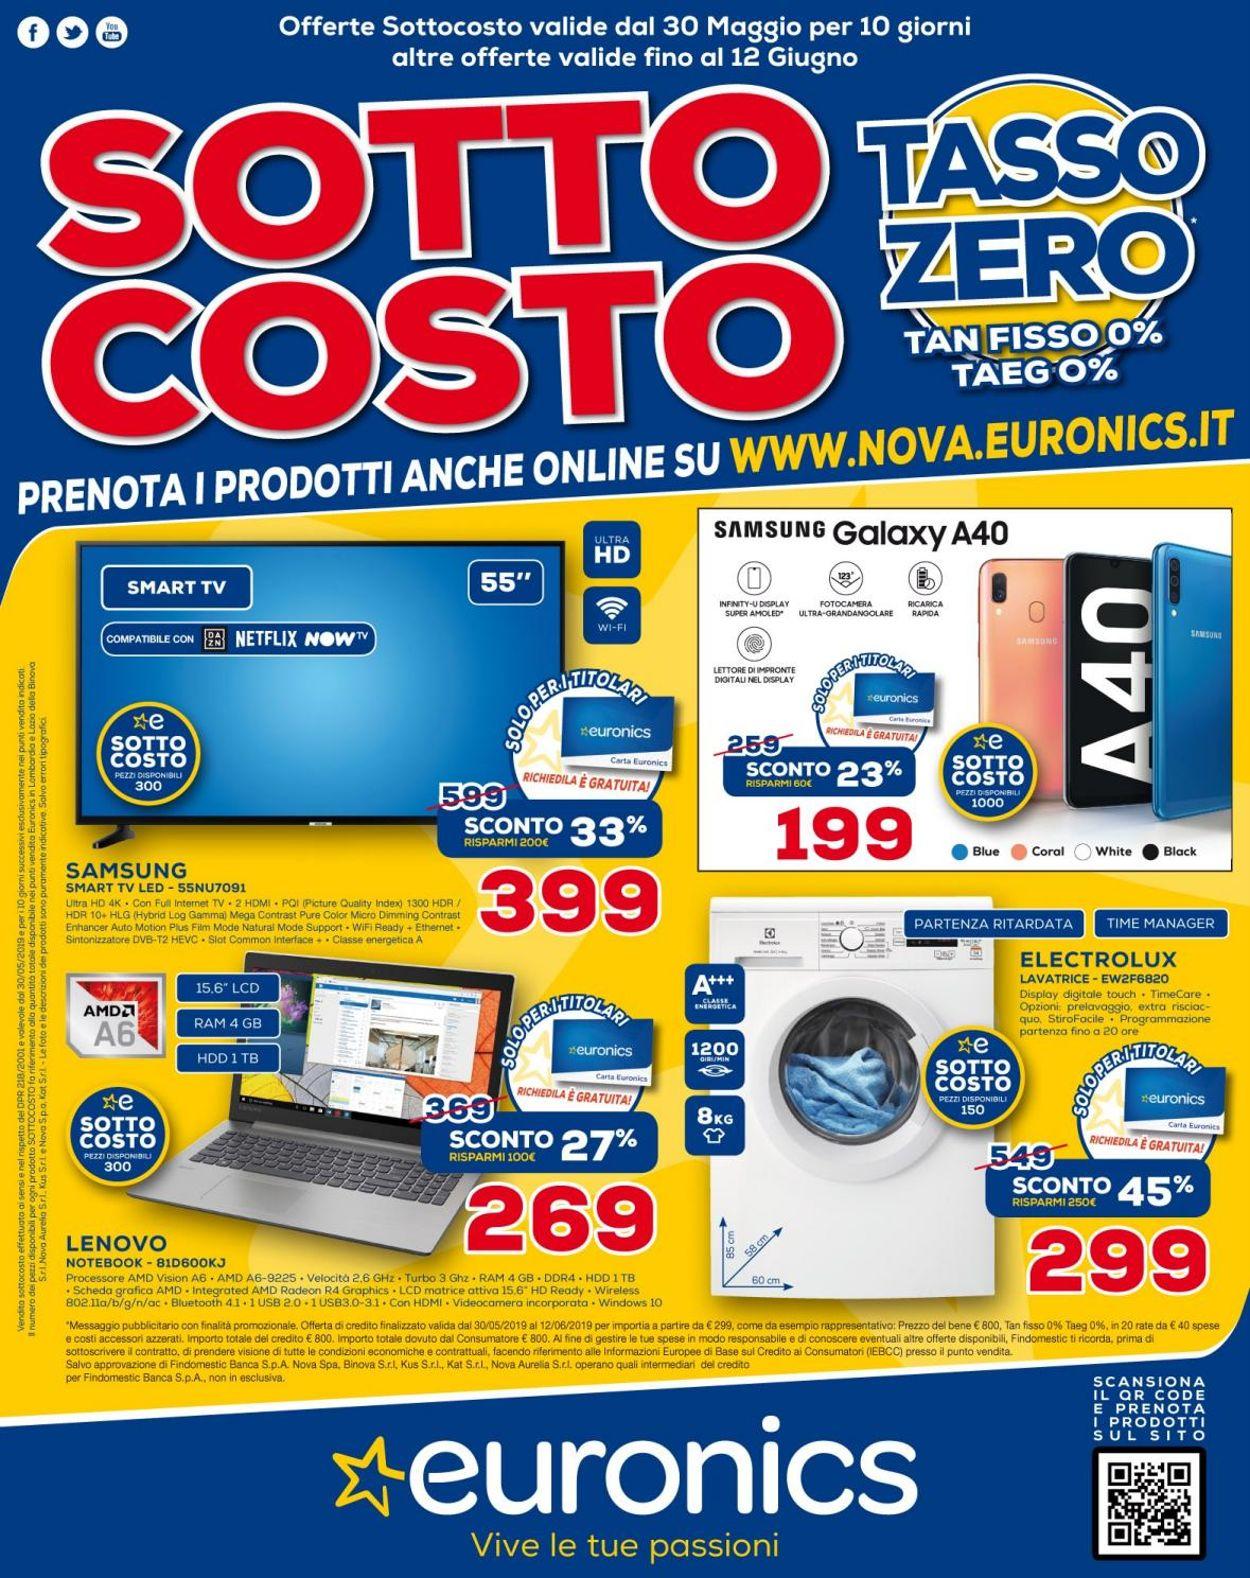 Volantino Euronics - Offerte 30/05-12/06/2019